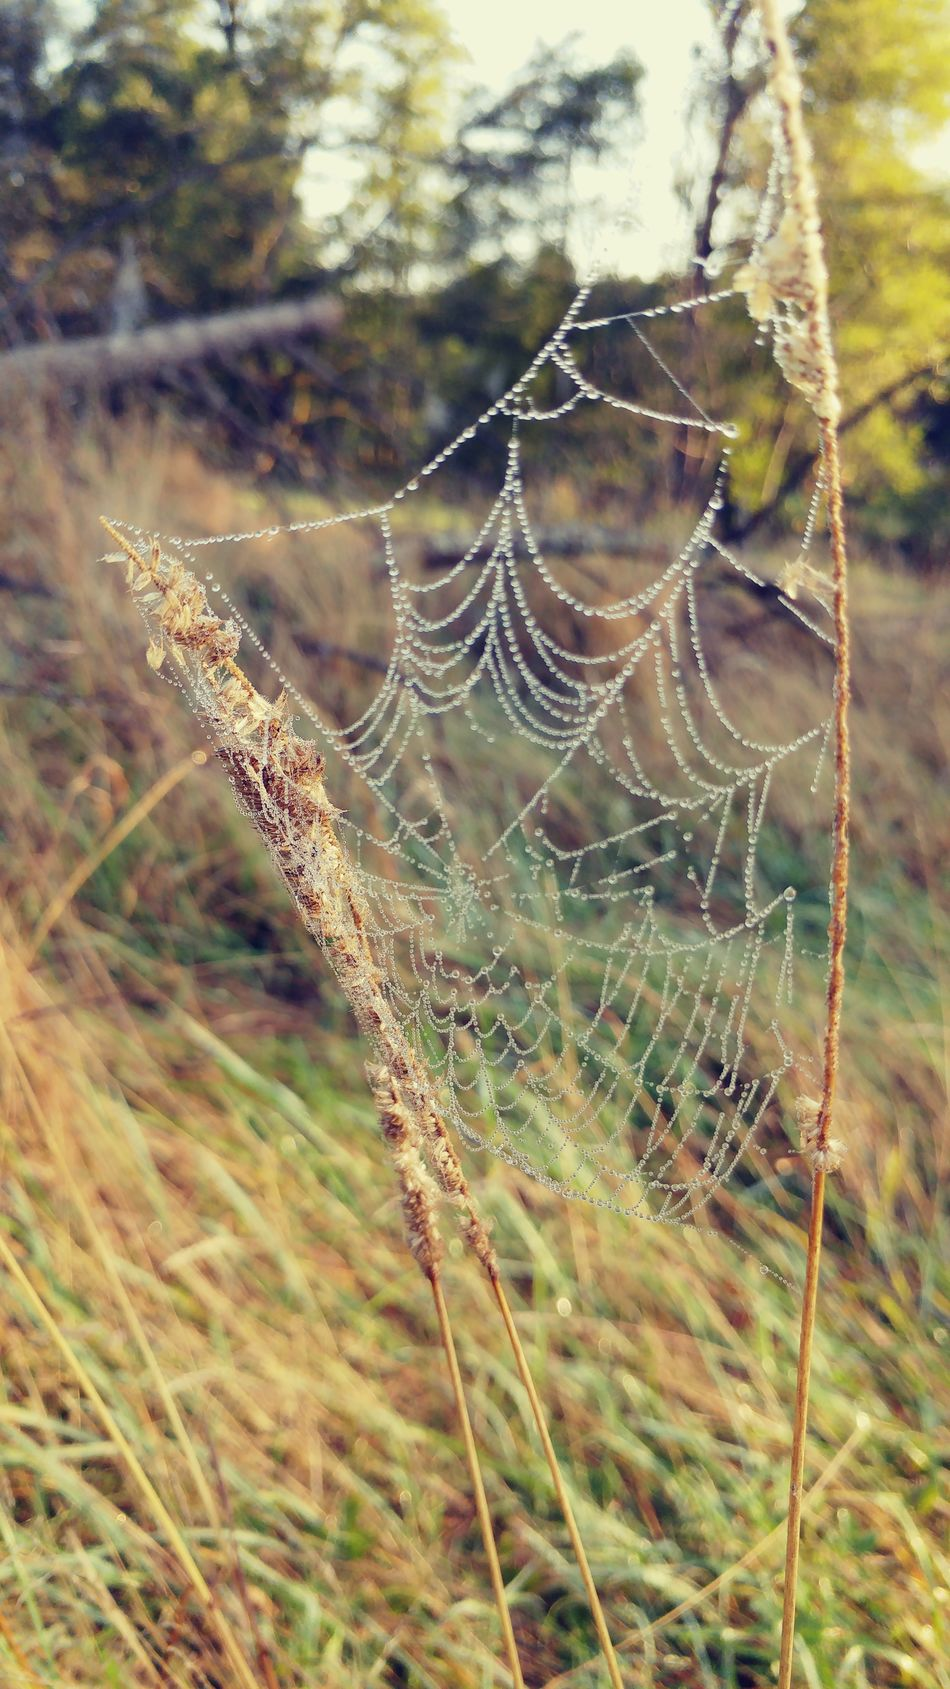 Grass Trawa Spiderweb Spiders Web Spider Web Smartphone Photography Smartphonephotography Lgg5photography LG  Lg G5